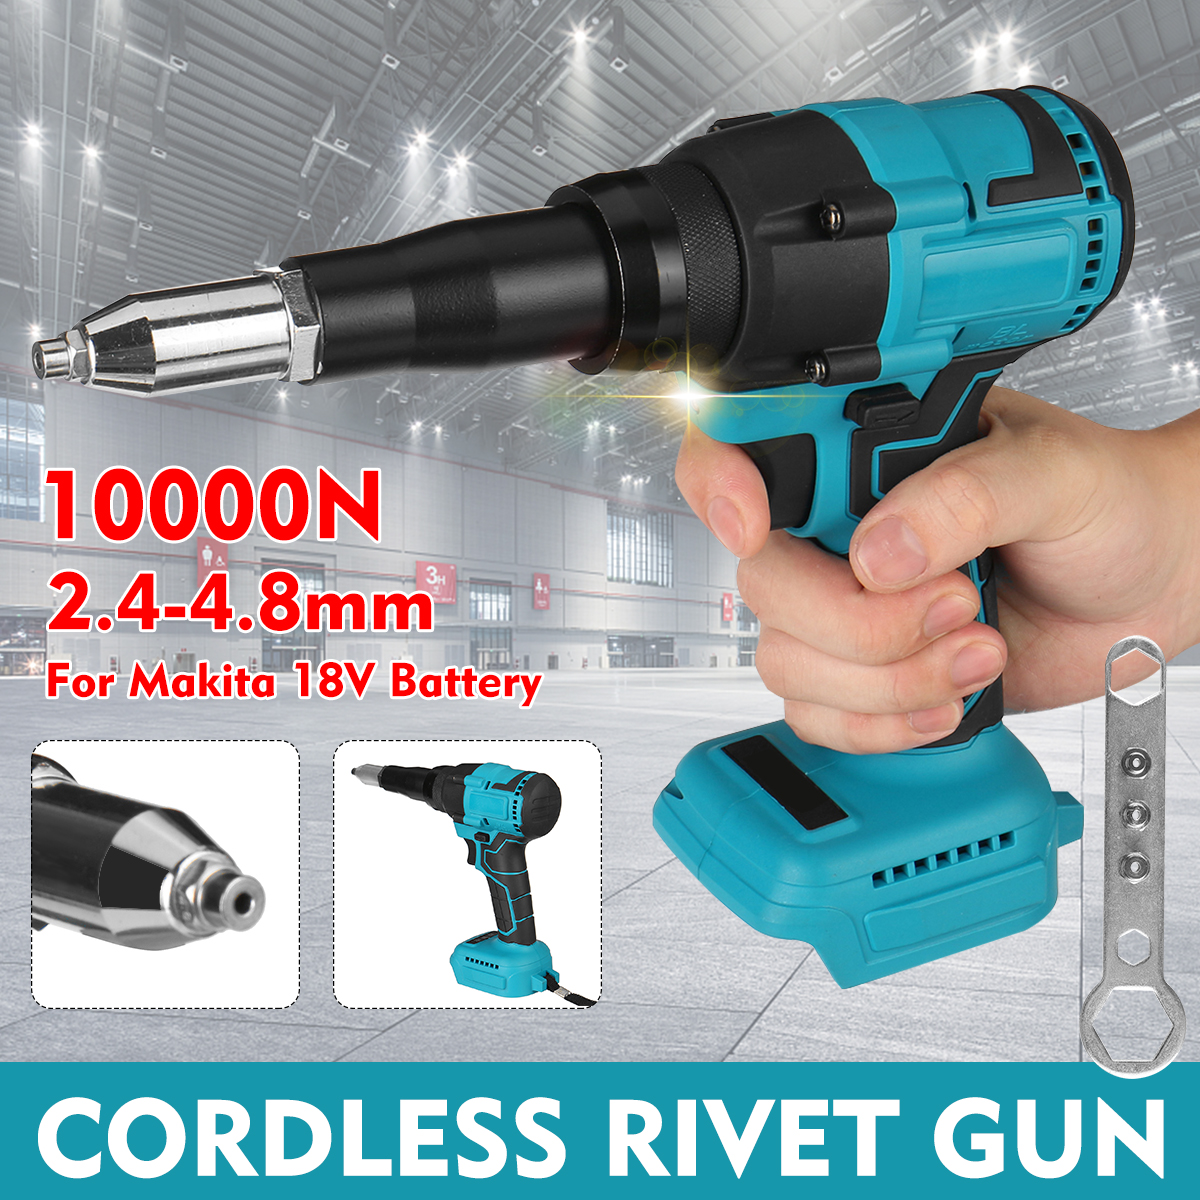 Electric Rivet Gun Cordless Rivet Nut Gun Drill Insert Nut Pull Riveting Tool 2 4 4 8mm With Led Light For Makita 18v Battery Mega Promo Fbf9 Cicig